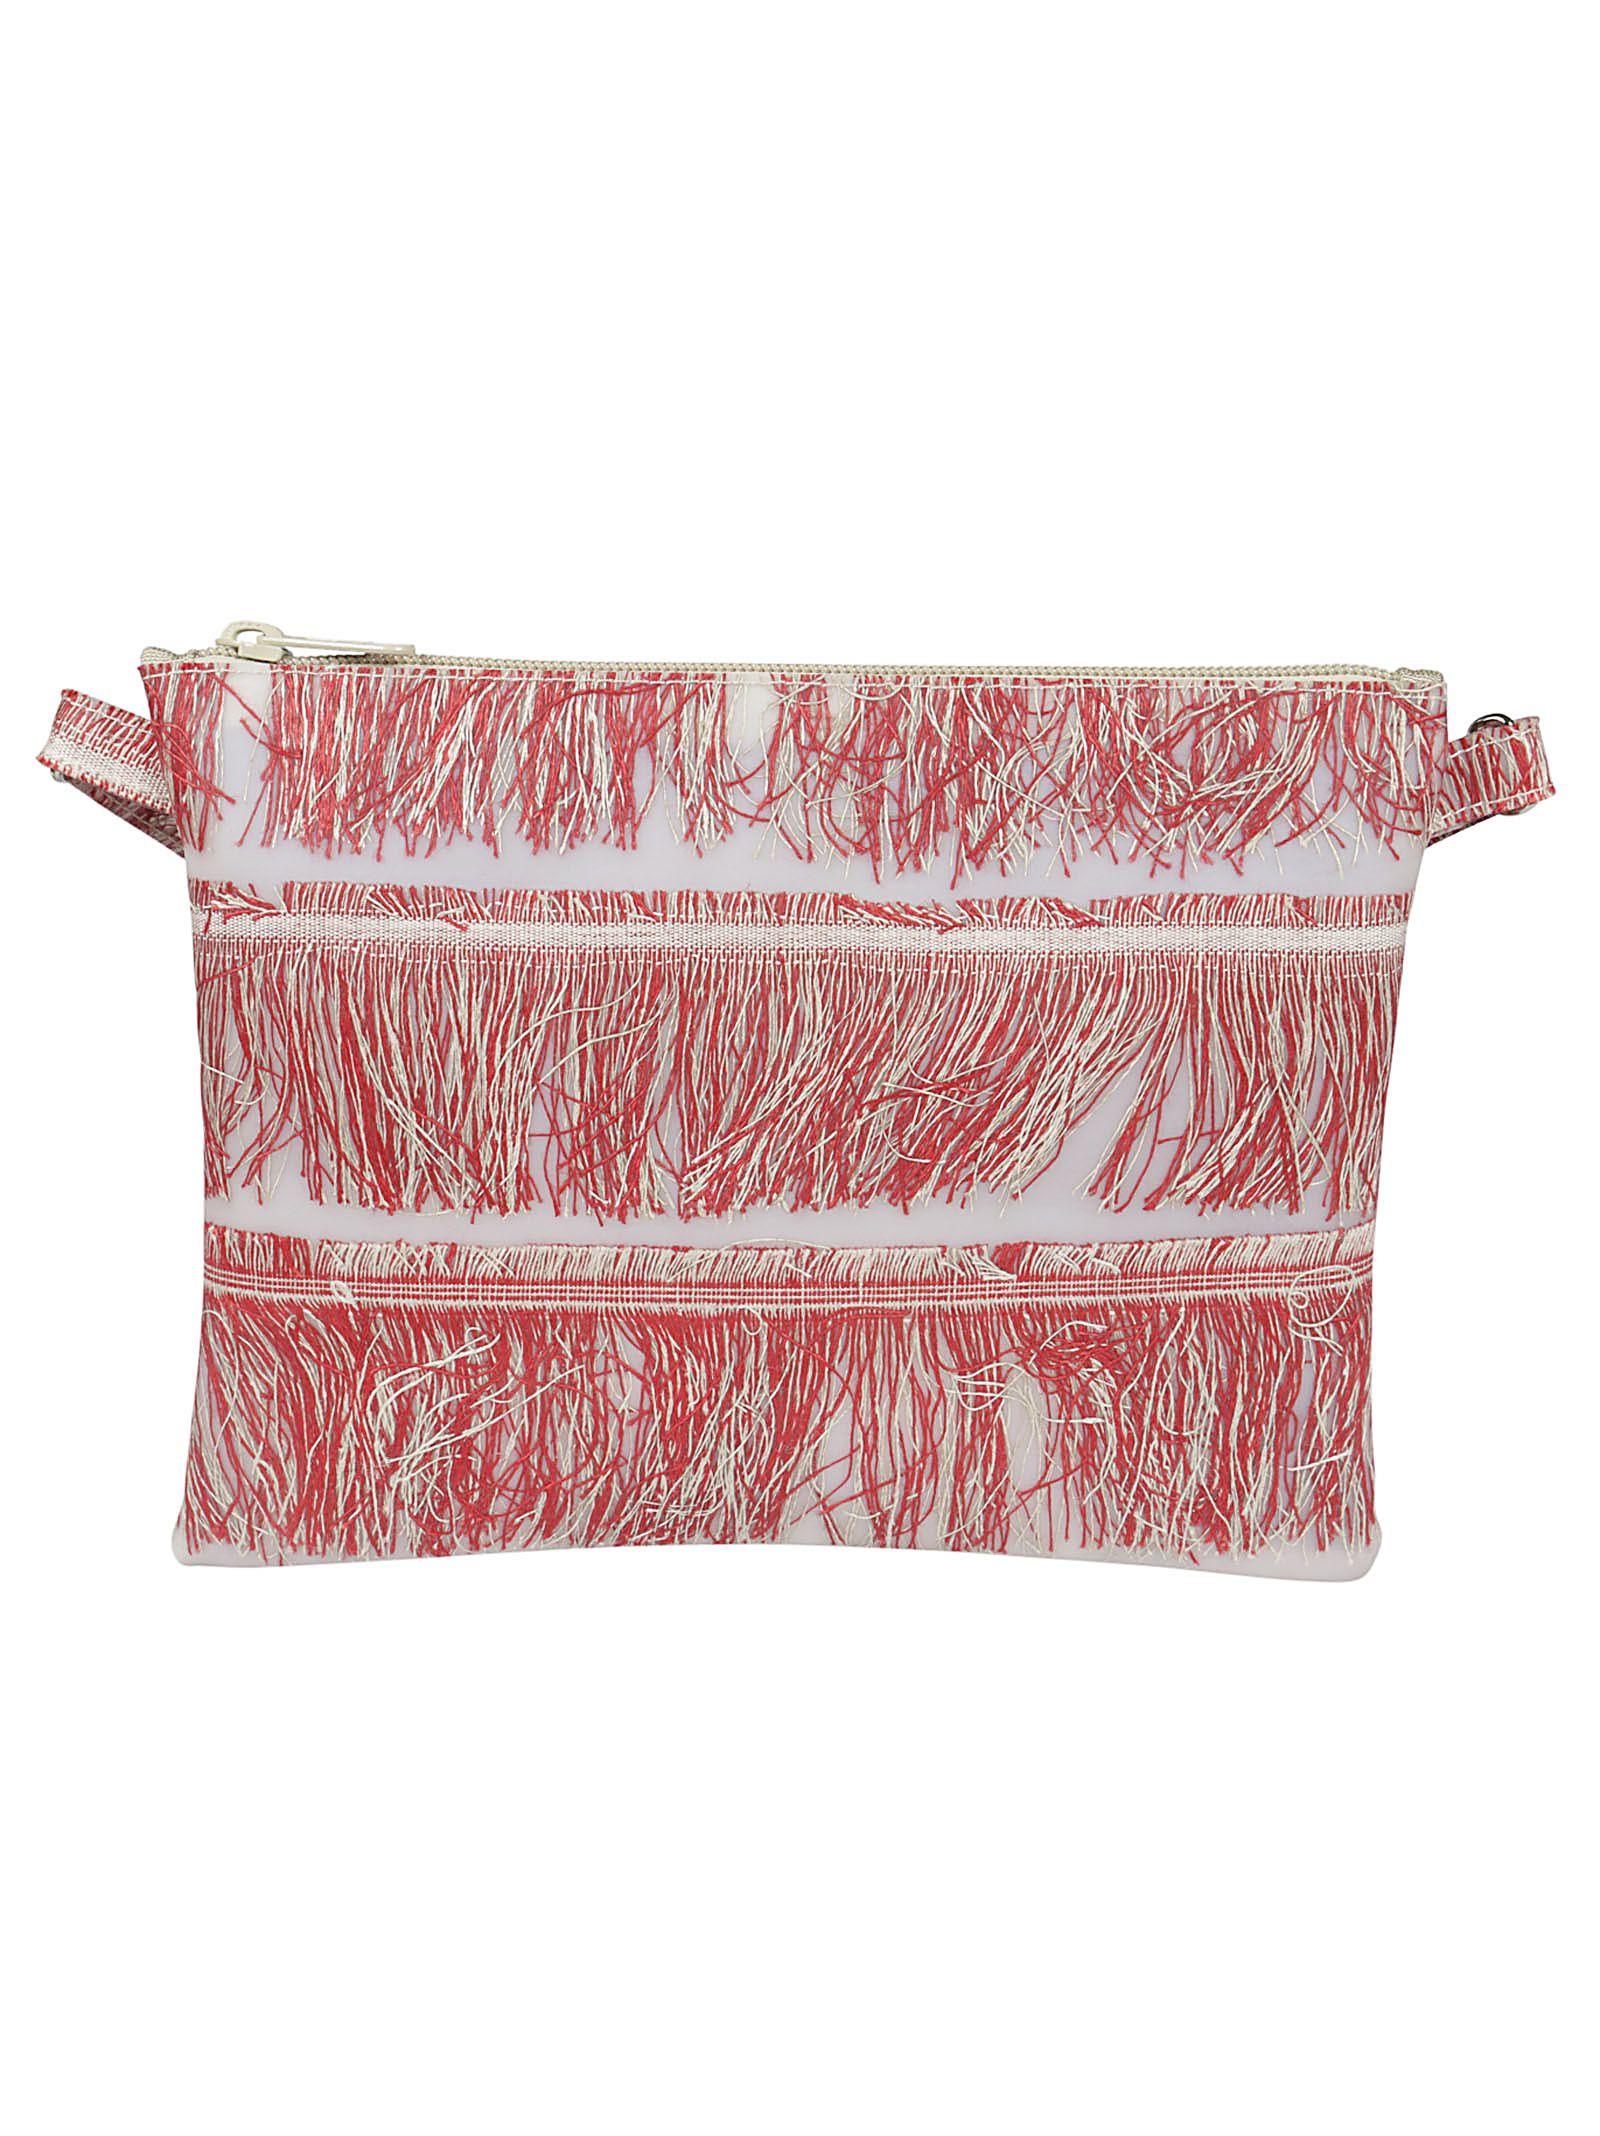 Luisa Cevese Frayed Detail Shoulder Bag